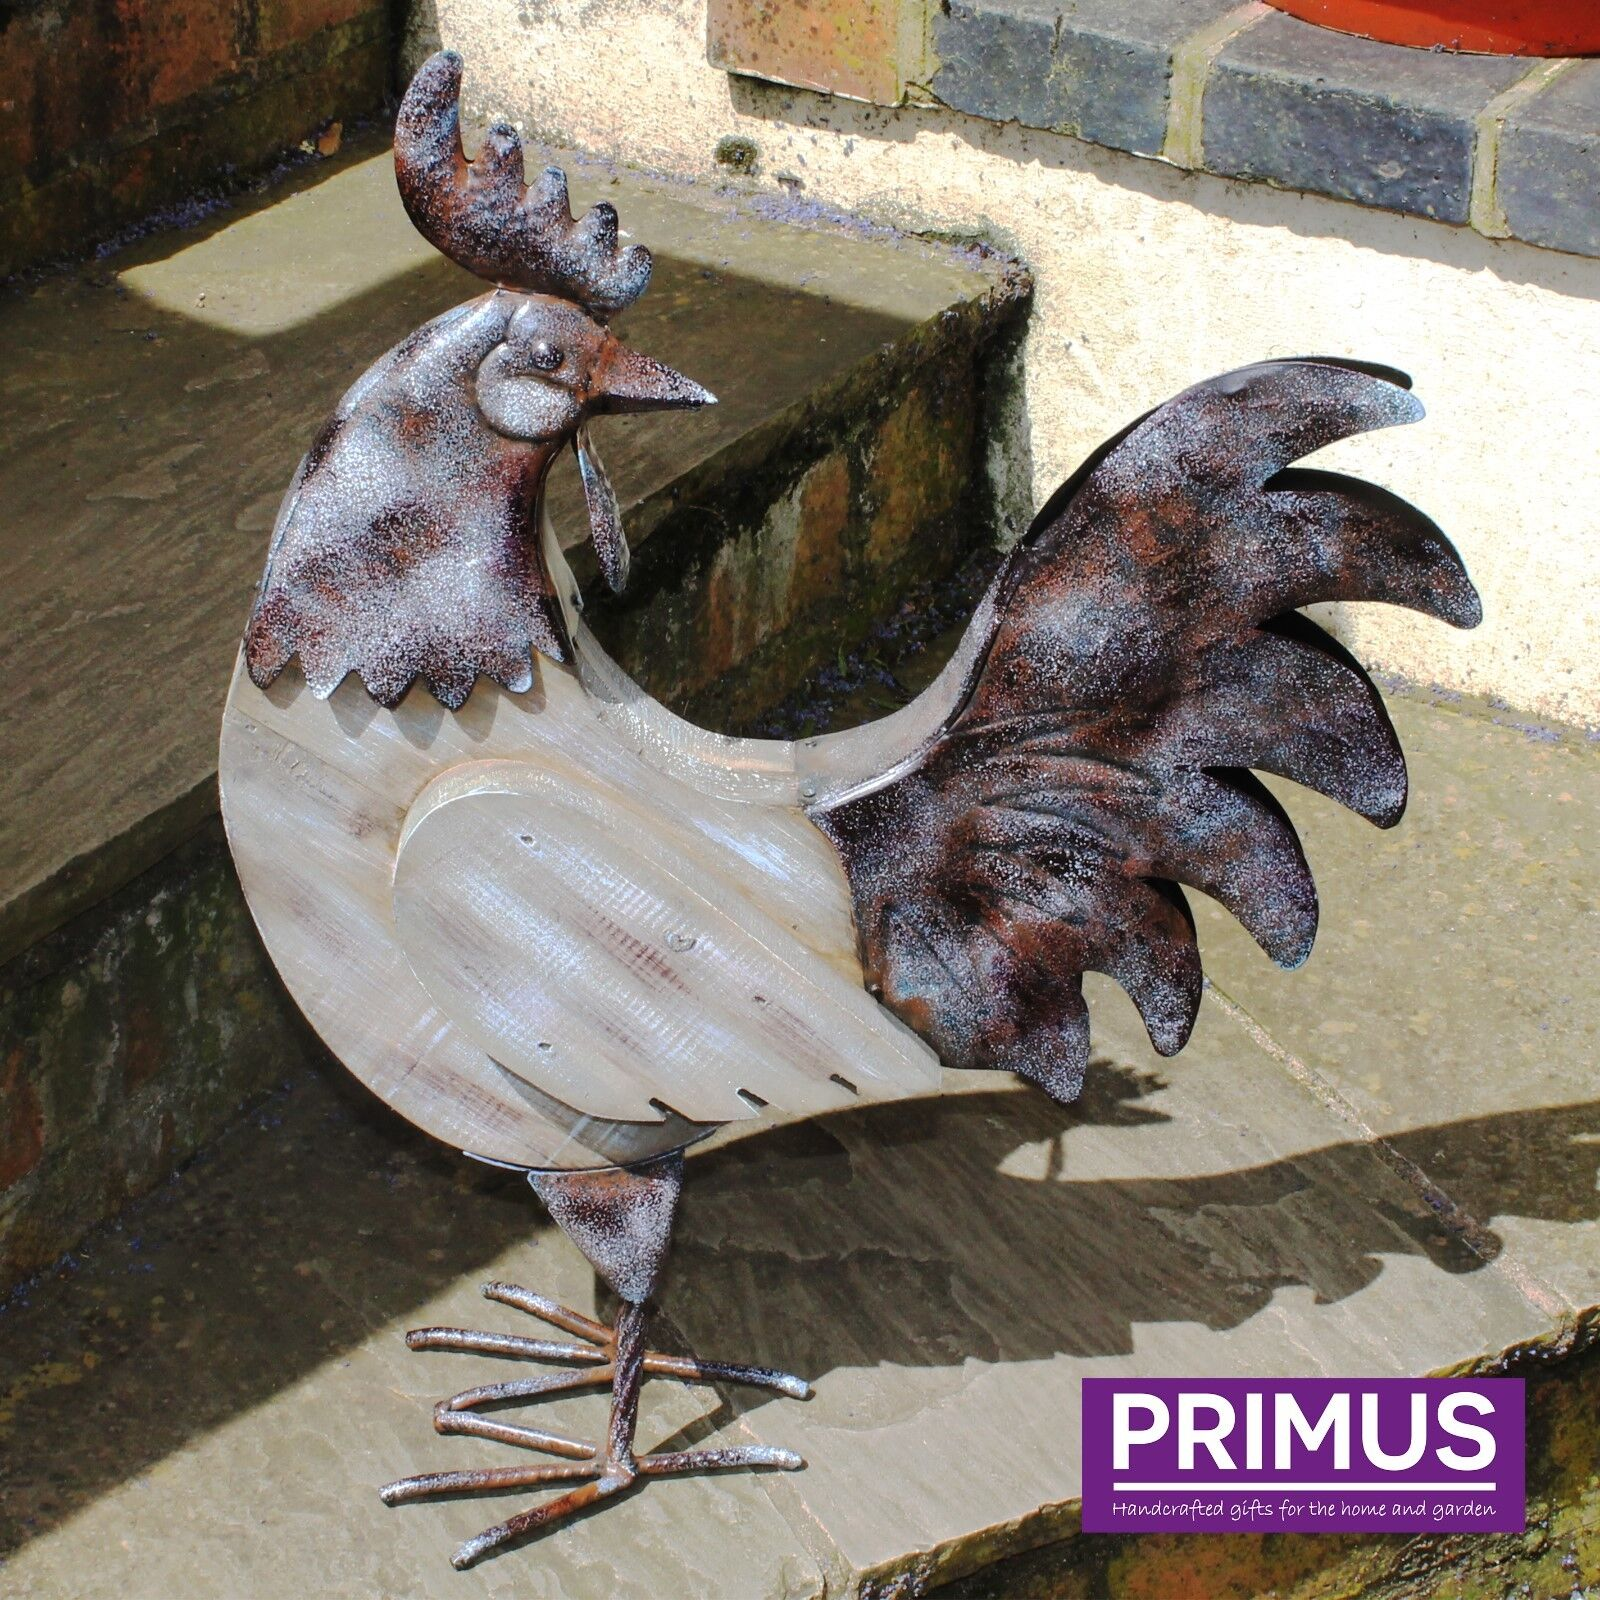 Primus Hand Crafted Large Métal Toucan Décoration De Jardin Sculpture Pelouse Bird